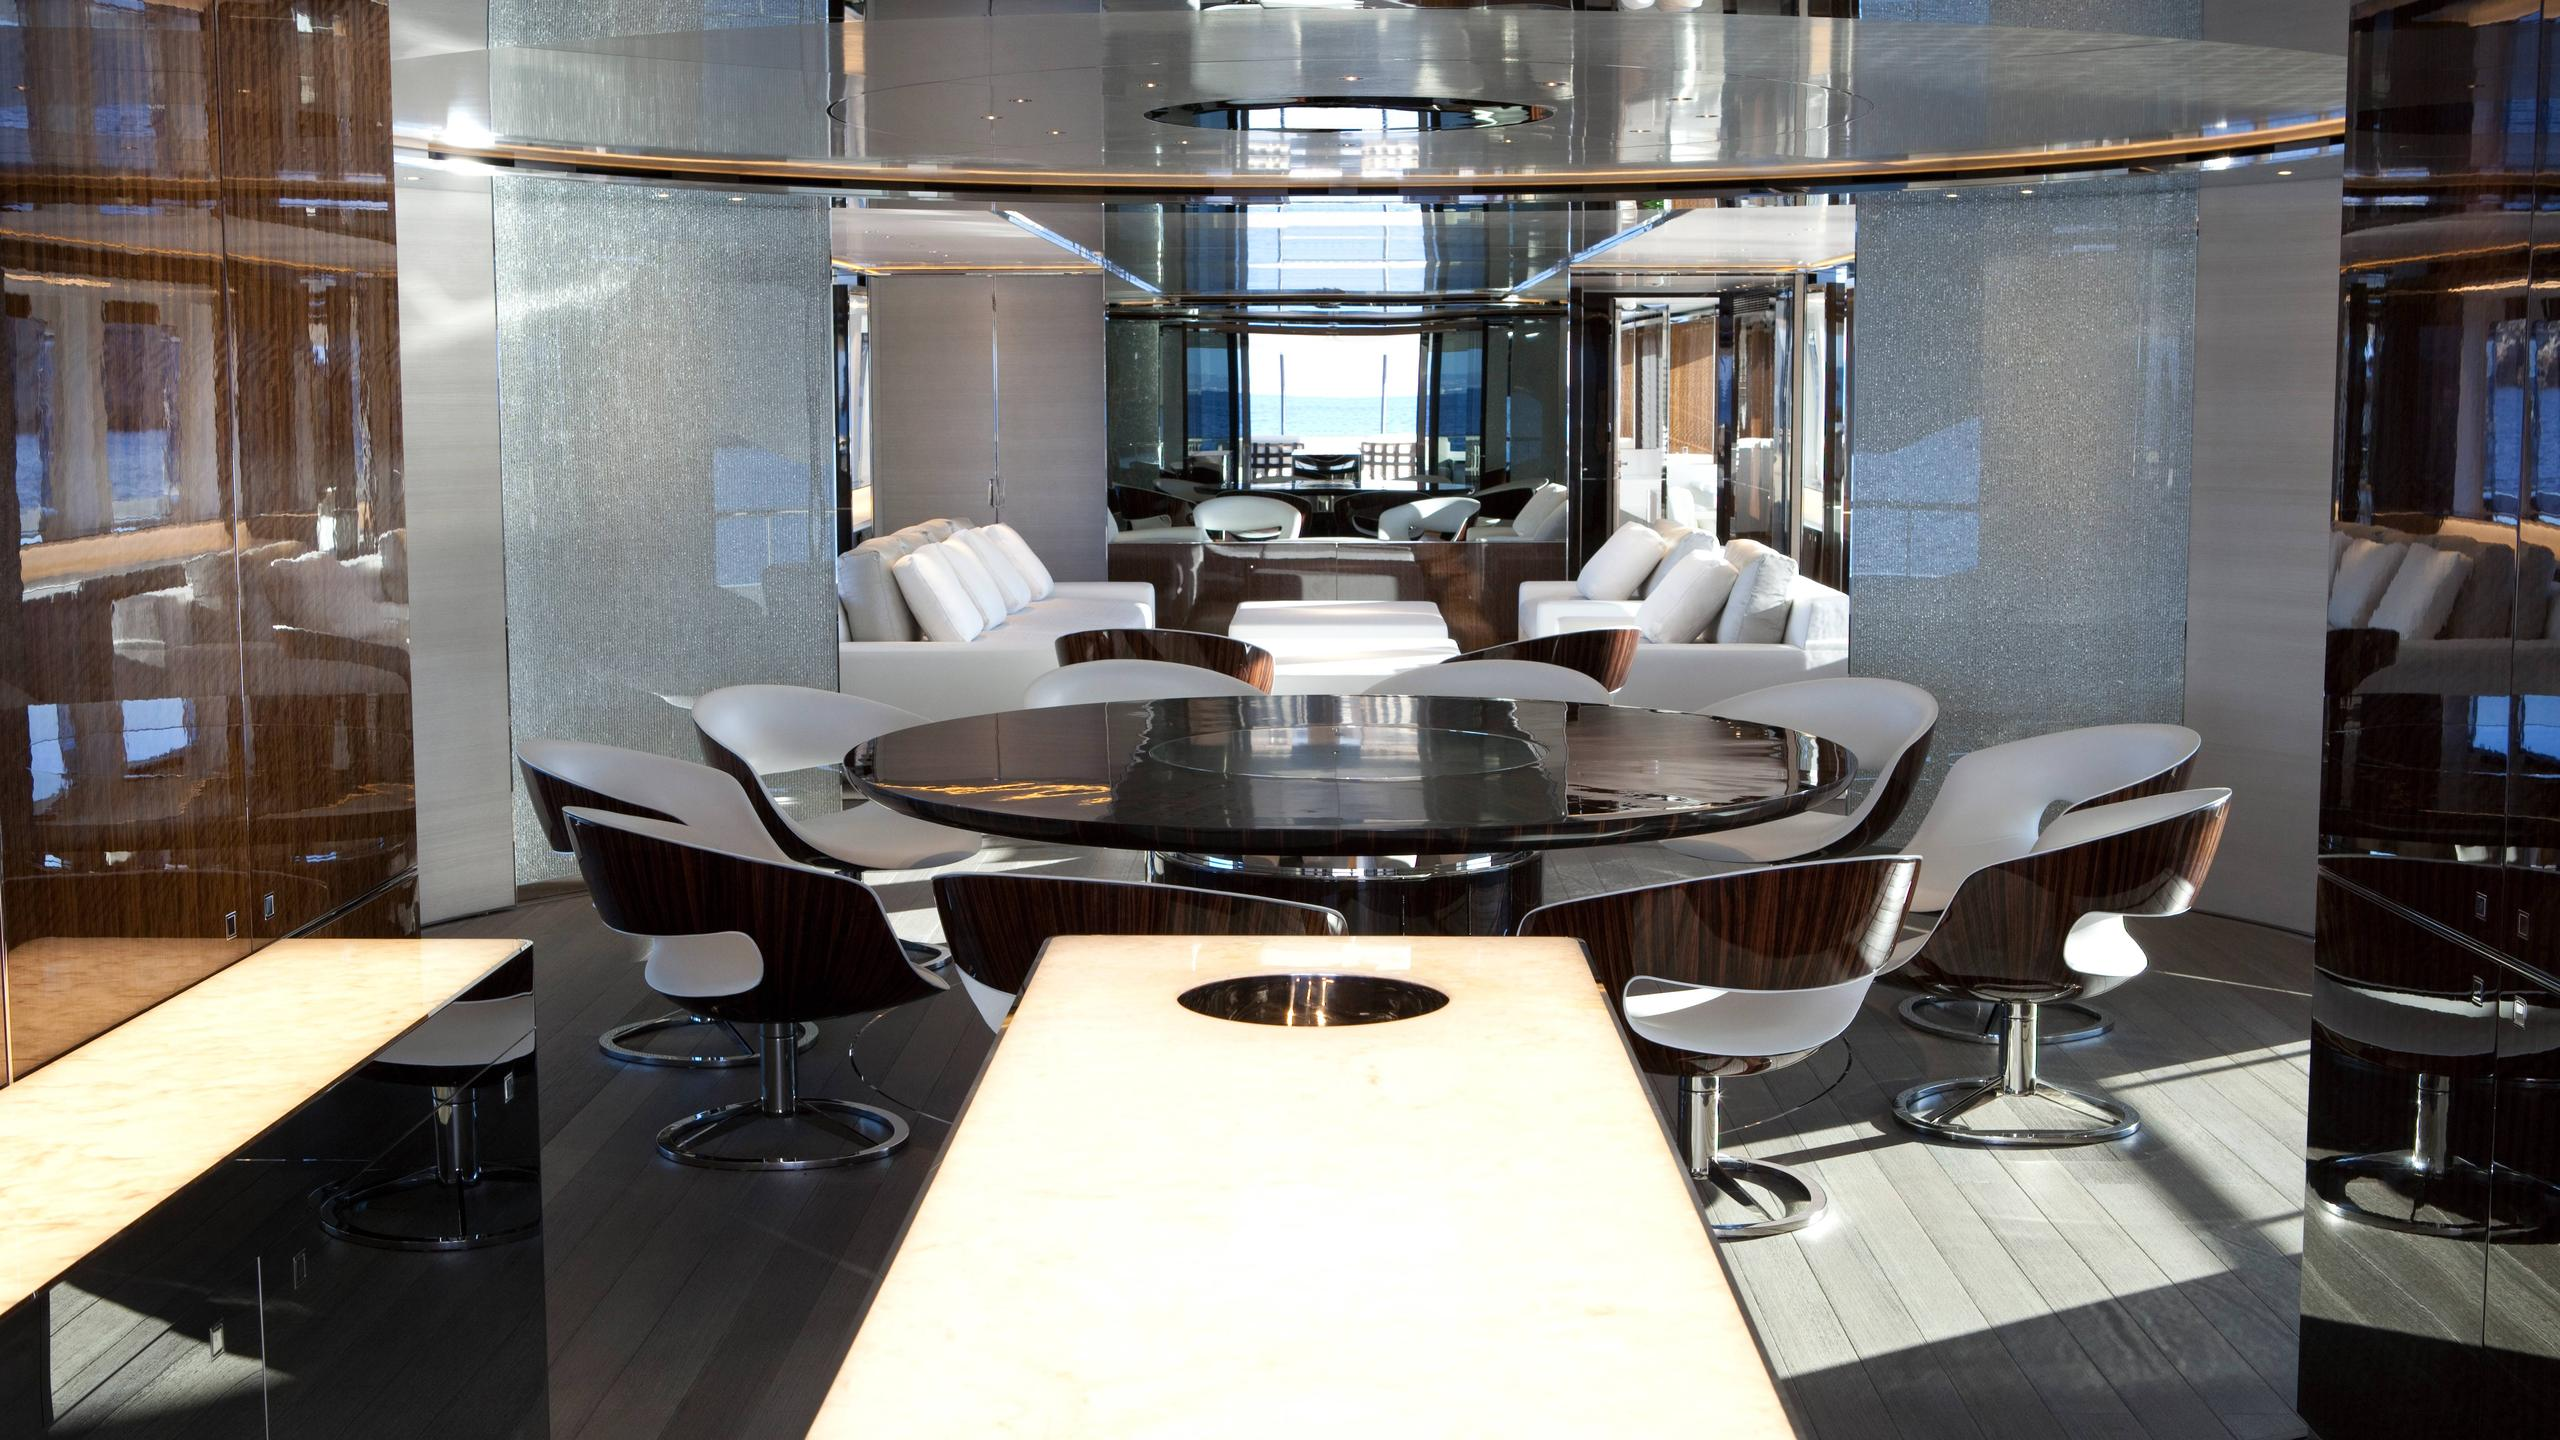 septimus-motor-yacht-heesen-2011-50m-dining-room